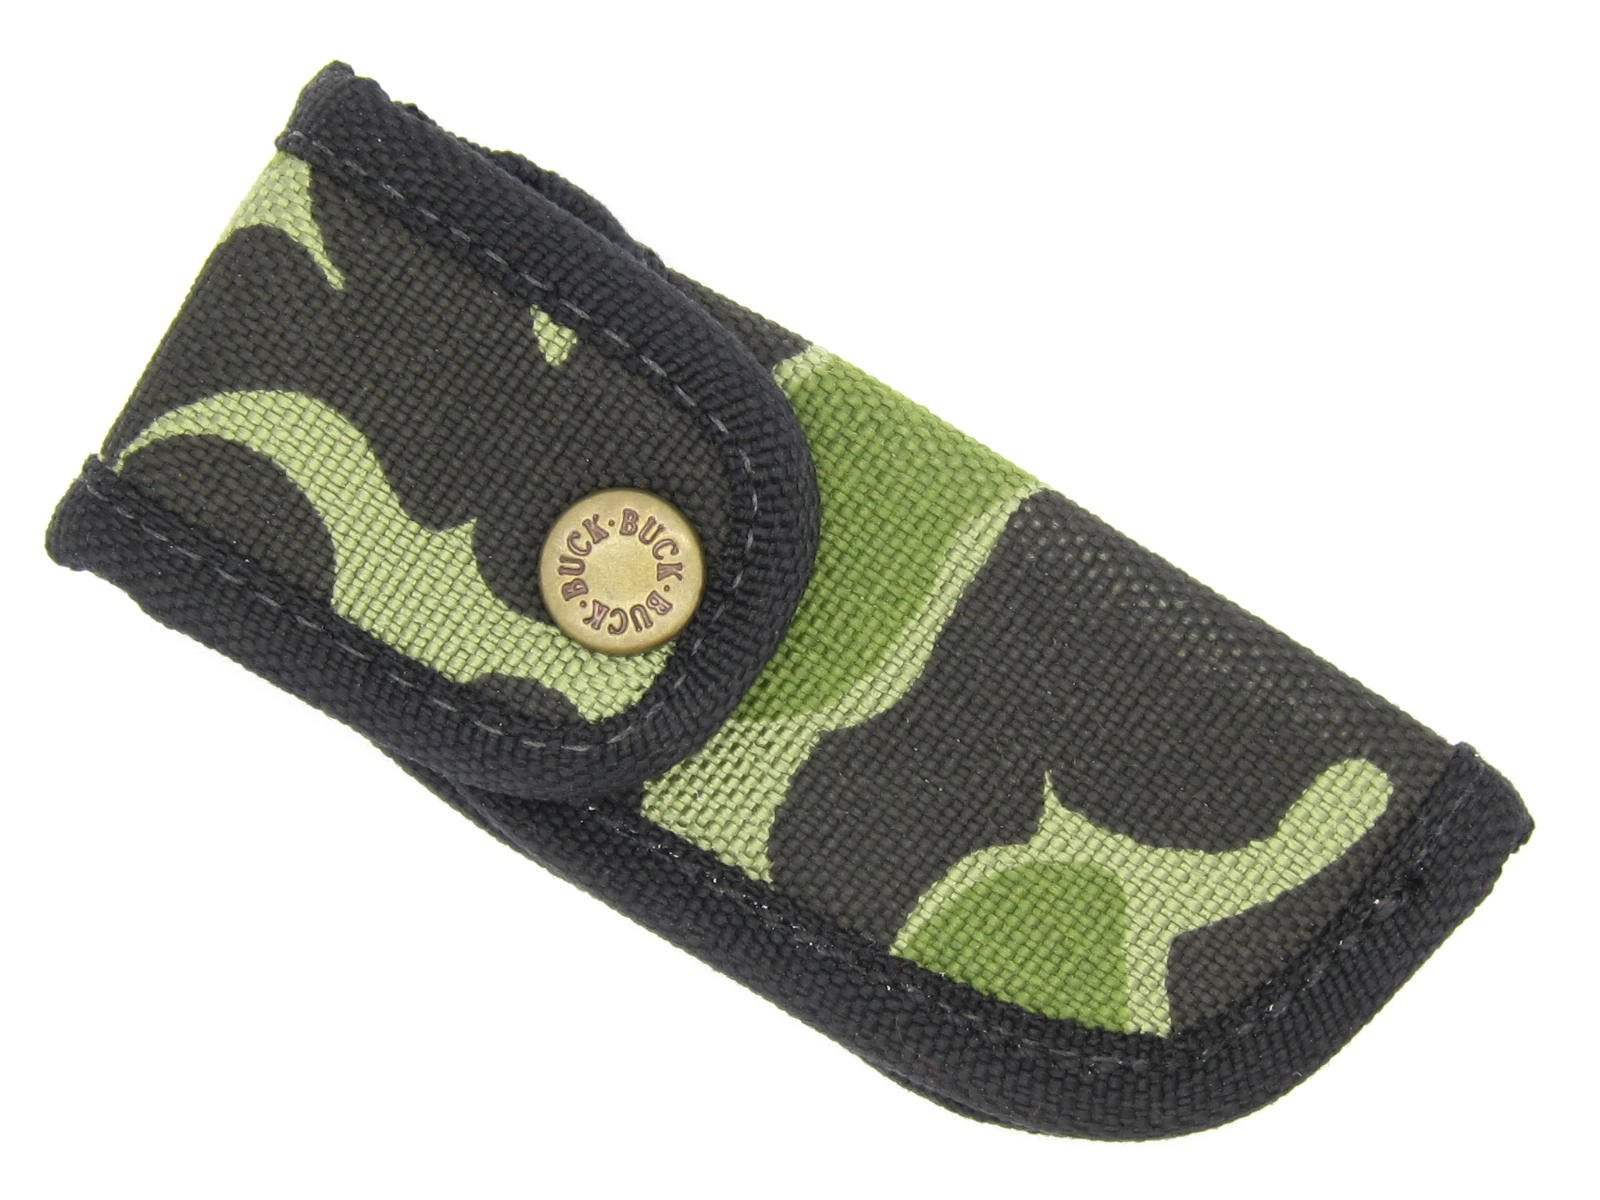 Buck USA 422 442 484 532 500 112 Ranger Bucklite Camo Cordura Nylon 4.25'' Folding Hunter Knife Sheath